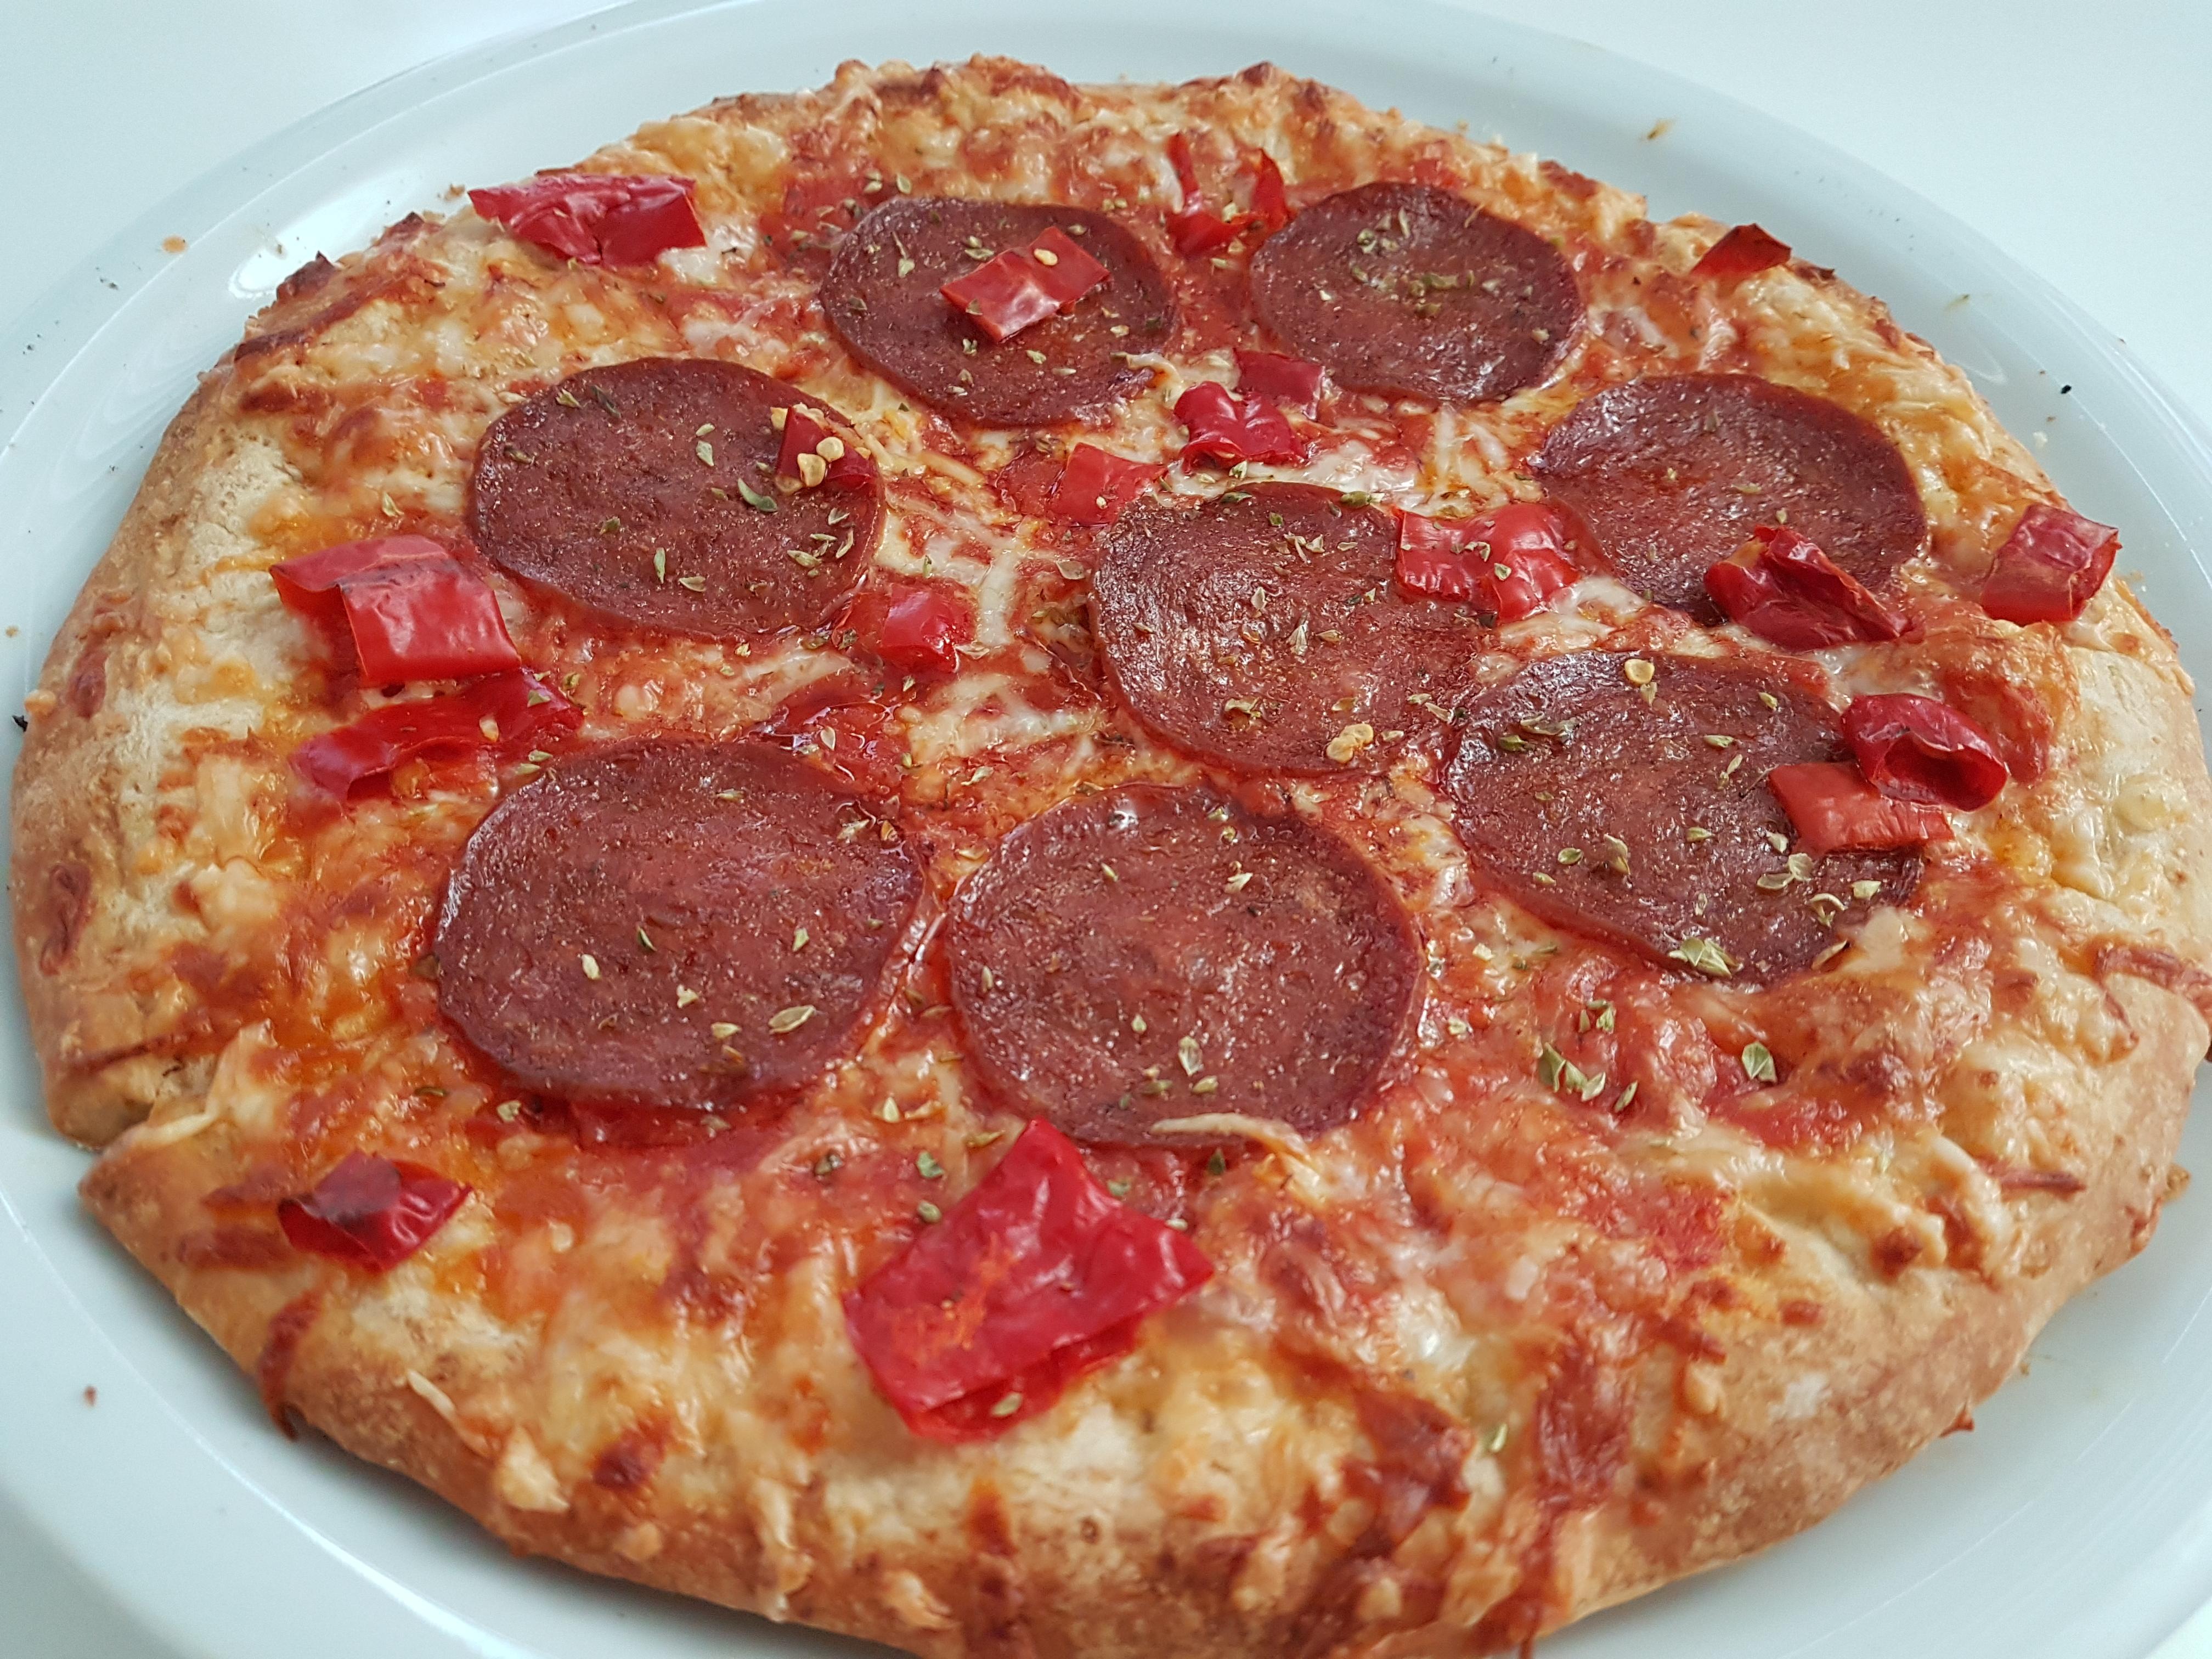 http://foodloader.net/Holz_2017-05-27_Pizza.jpg